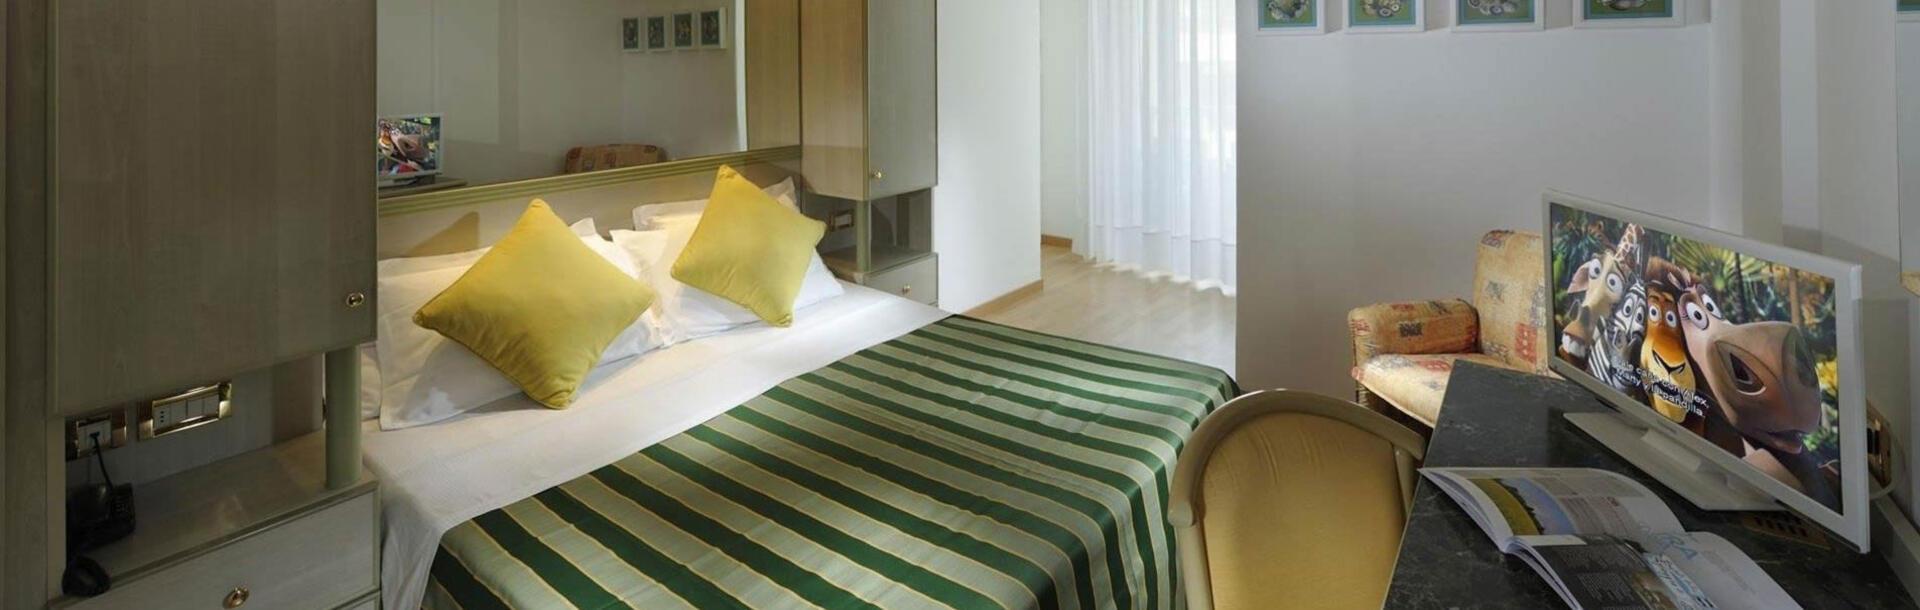 hotel-montecarlo hu egybenyilo-csaladi-szoba 013